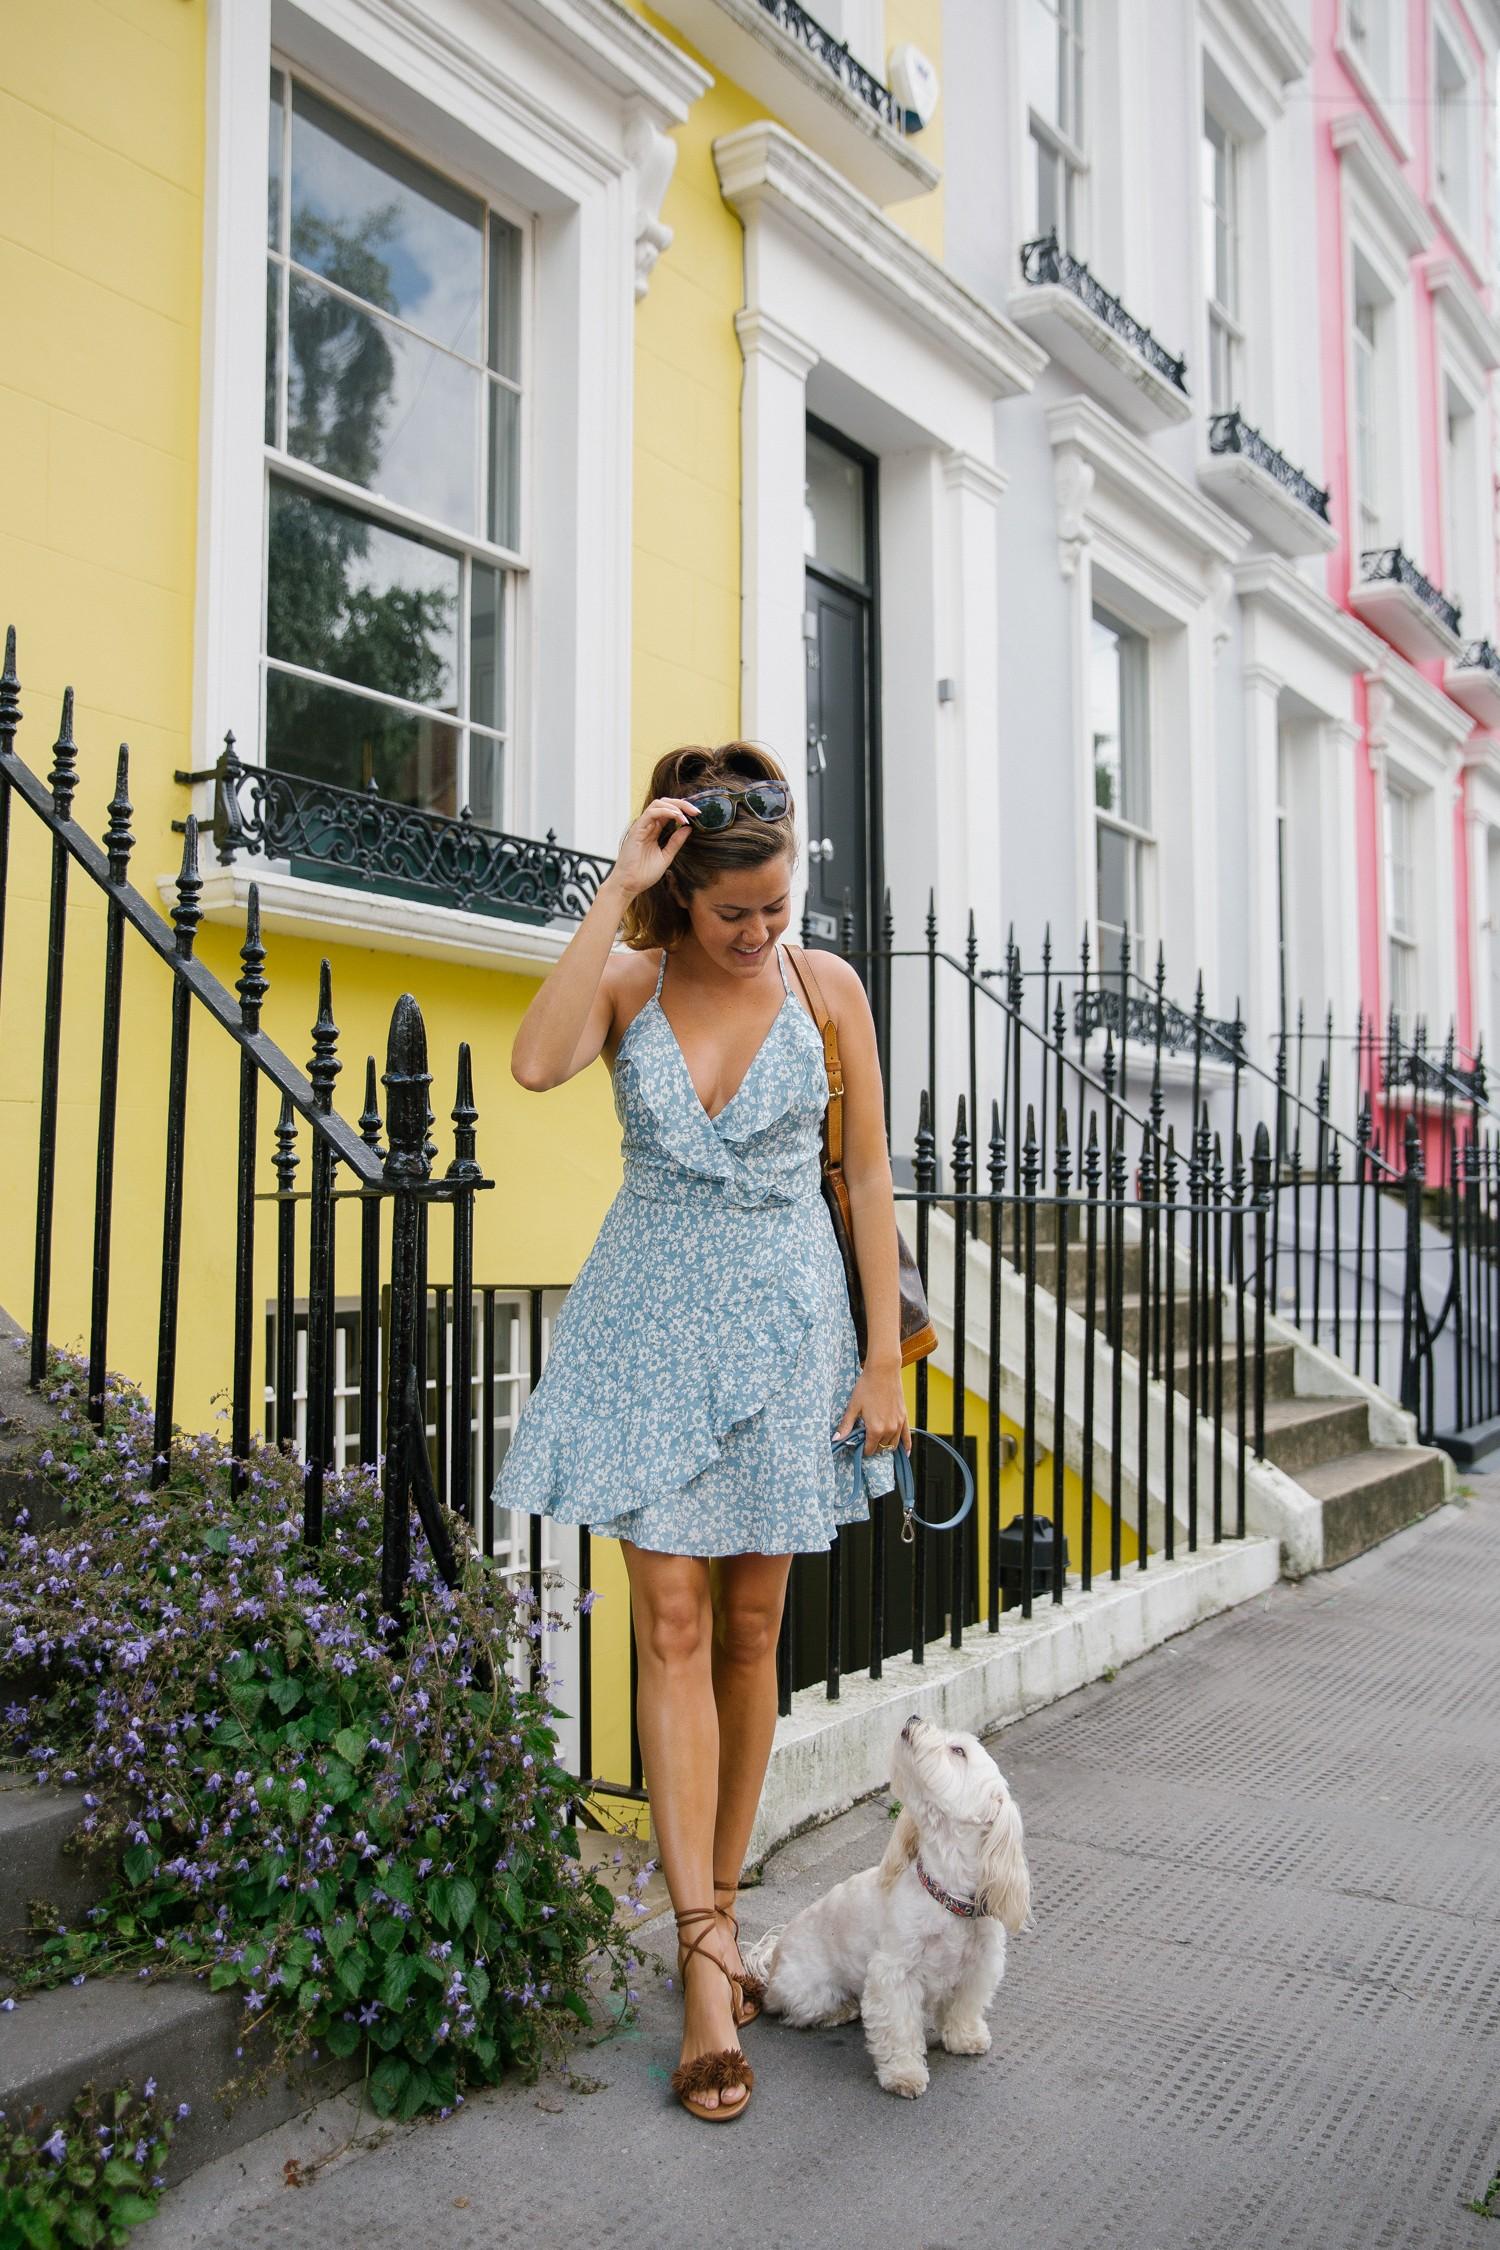 Farmacy Notting Hill-3